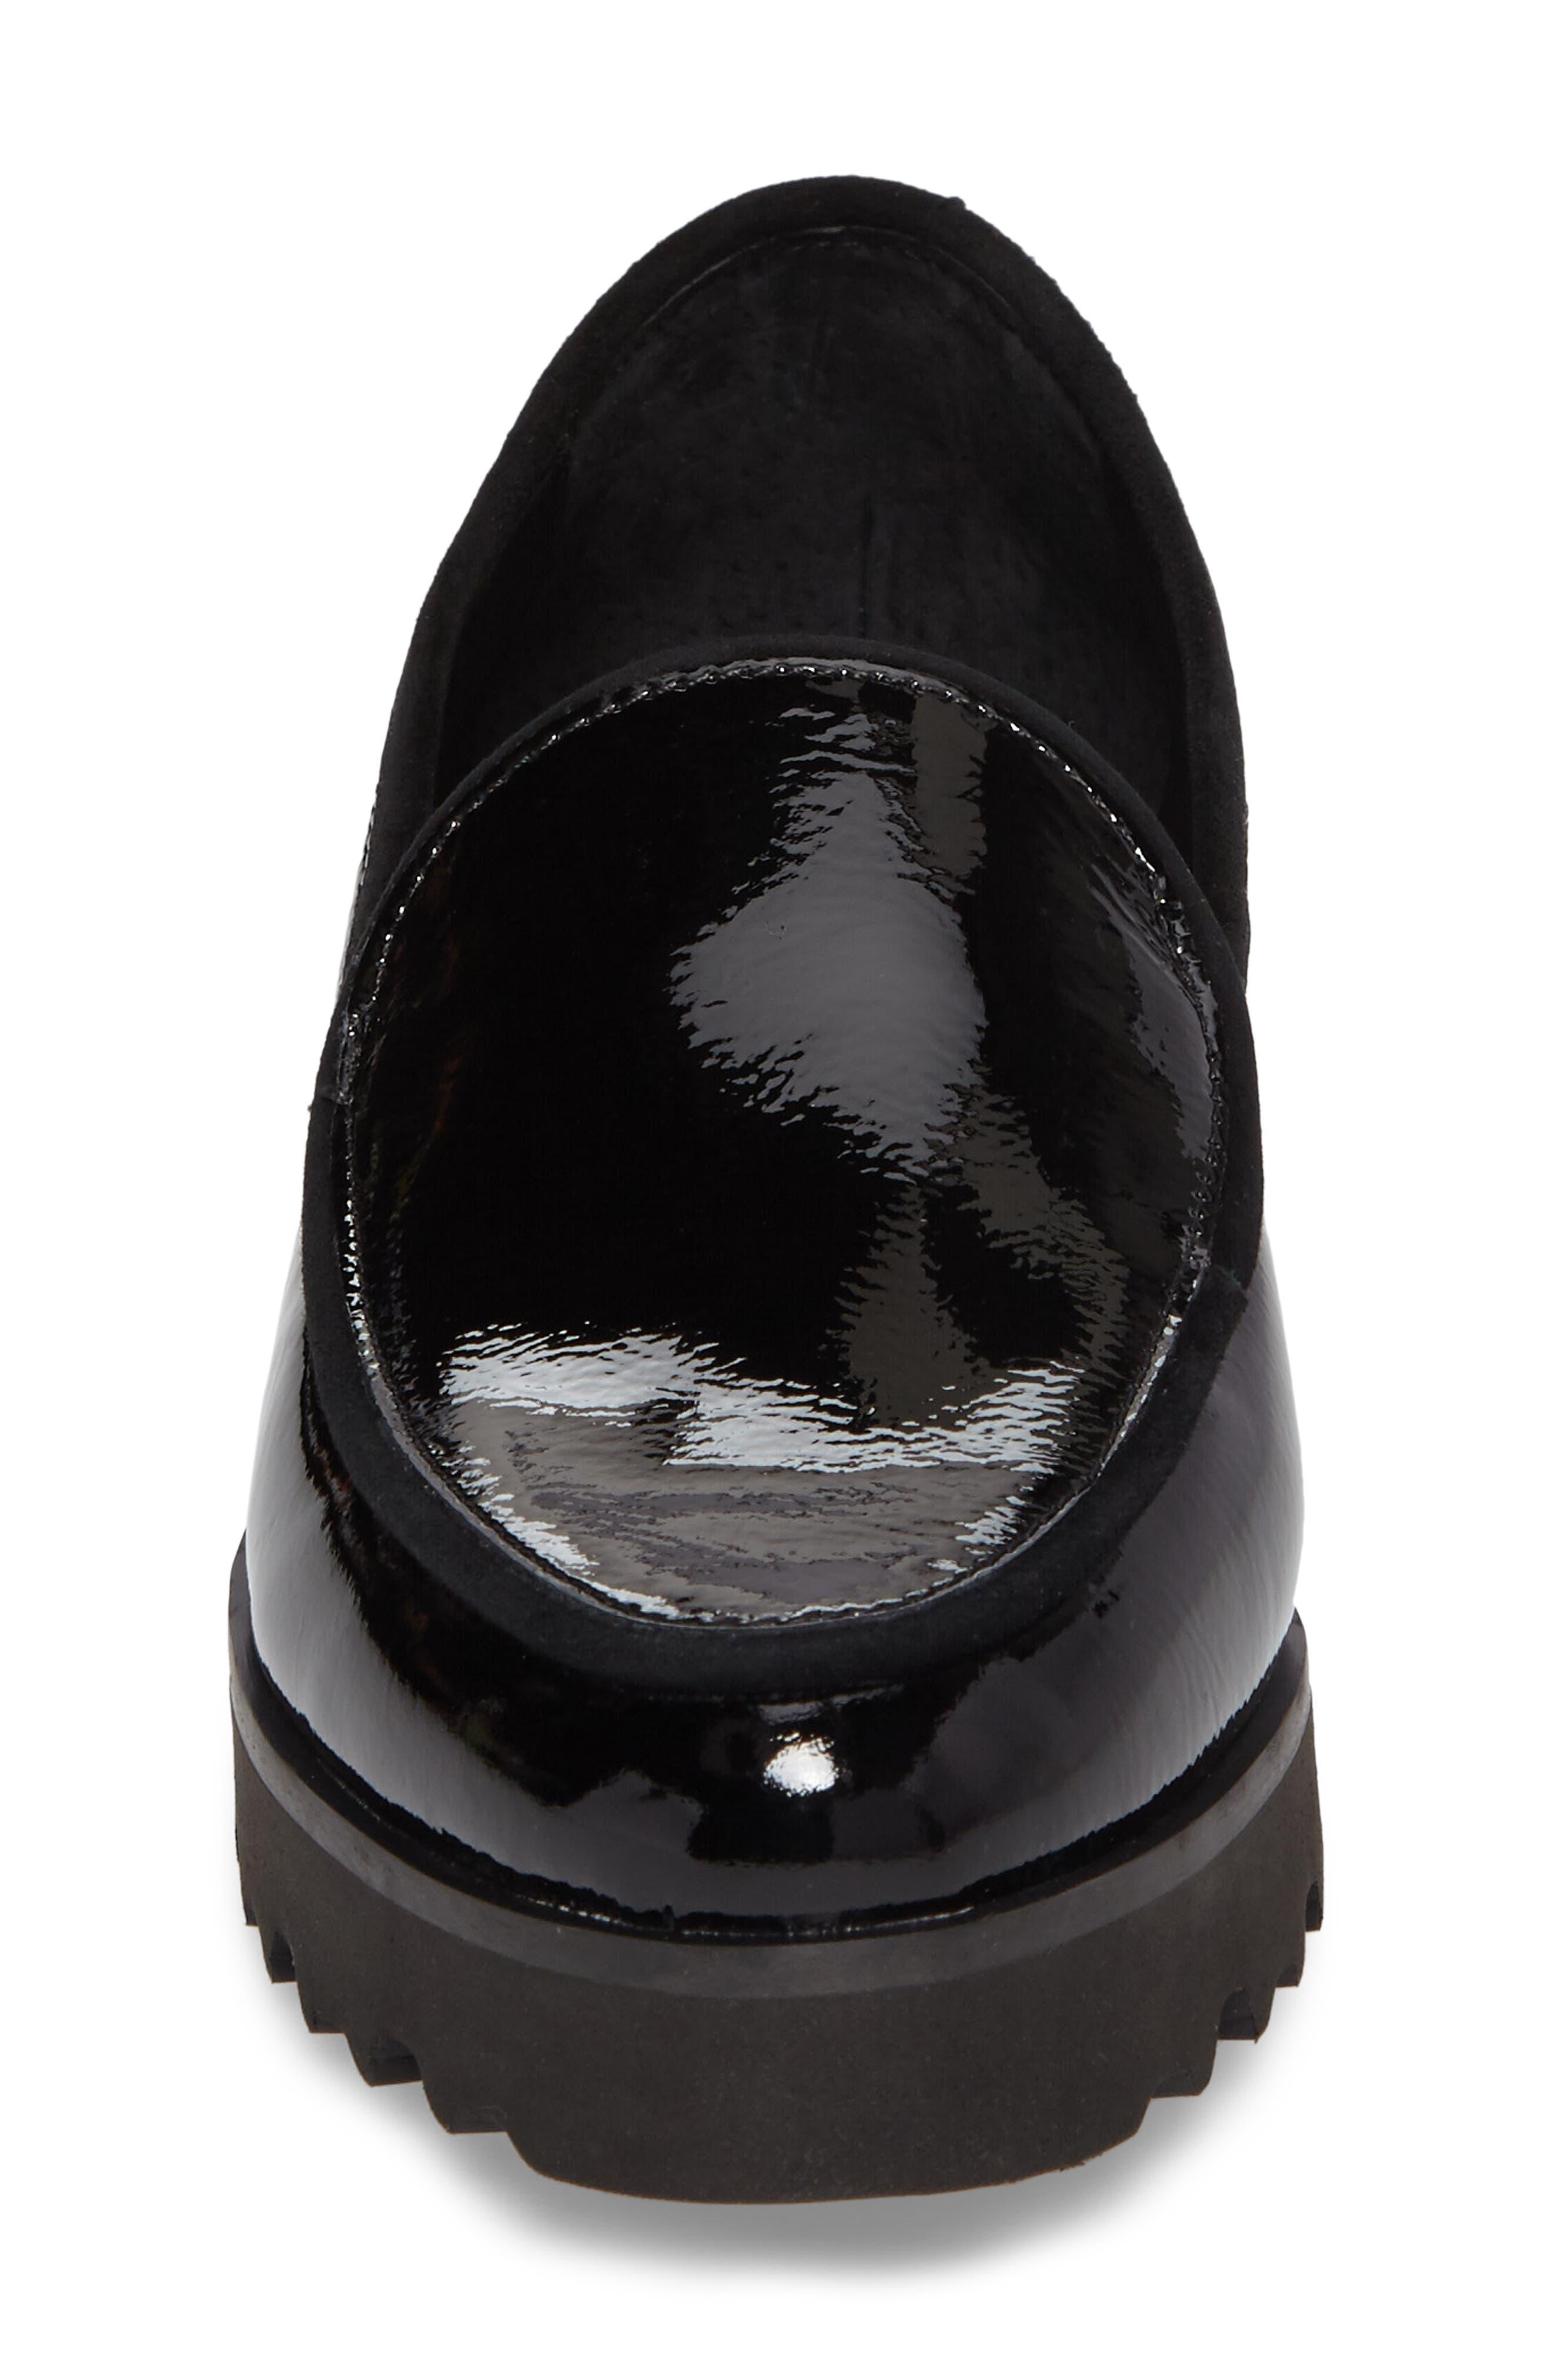 Elen Loafer,                             Alternate thumbnail 4, color,                             Black Leather